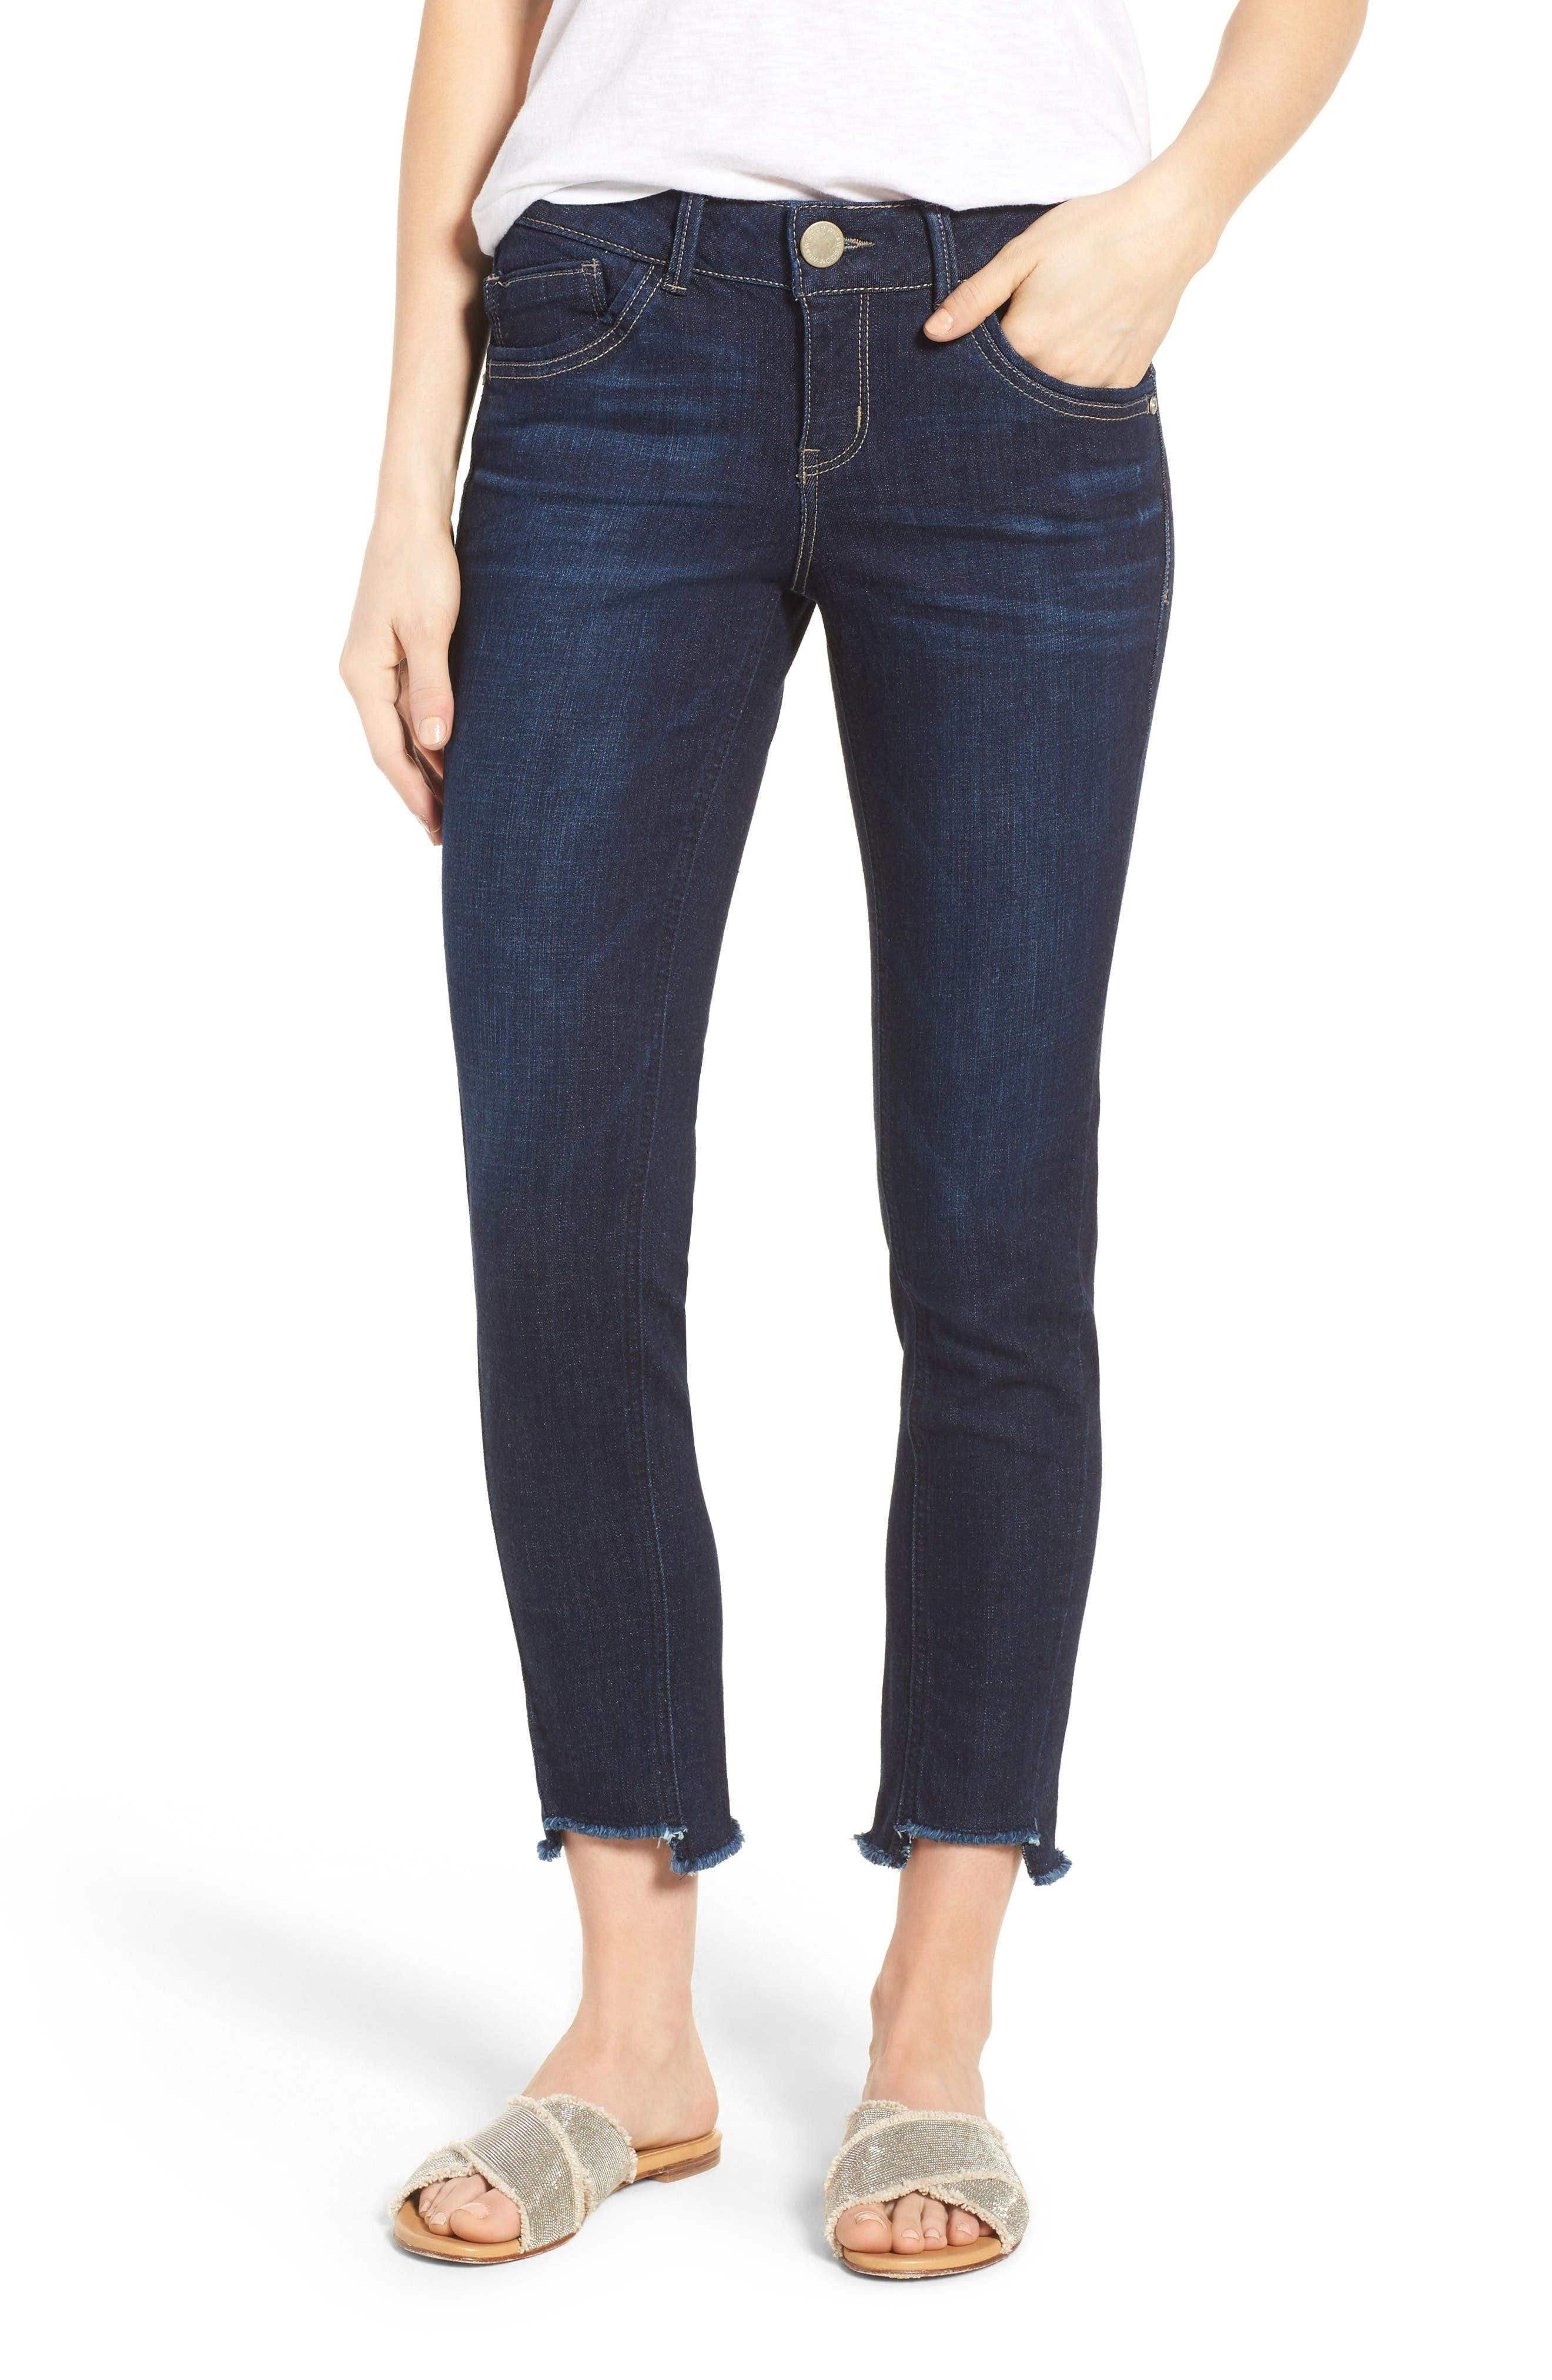 Wit & Wisdom Ankle Skimmer Jeans (Nordstrom Exclusive) (Regular & Petite)